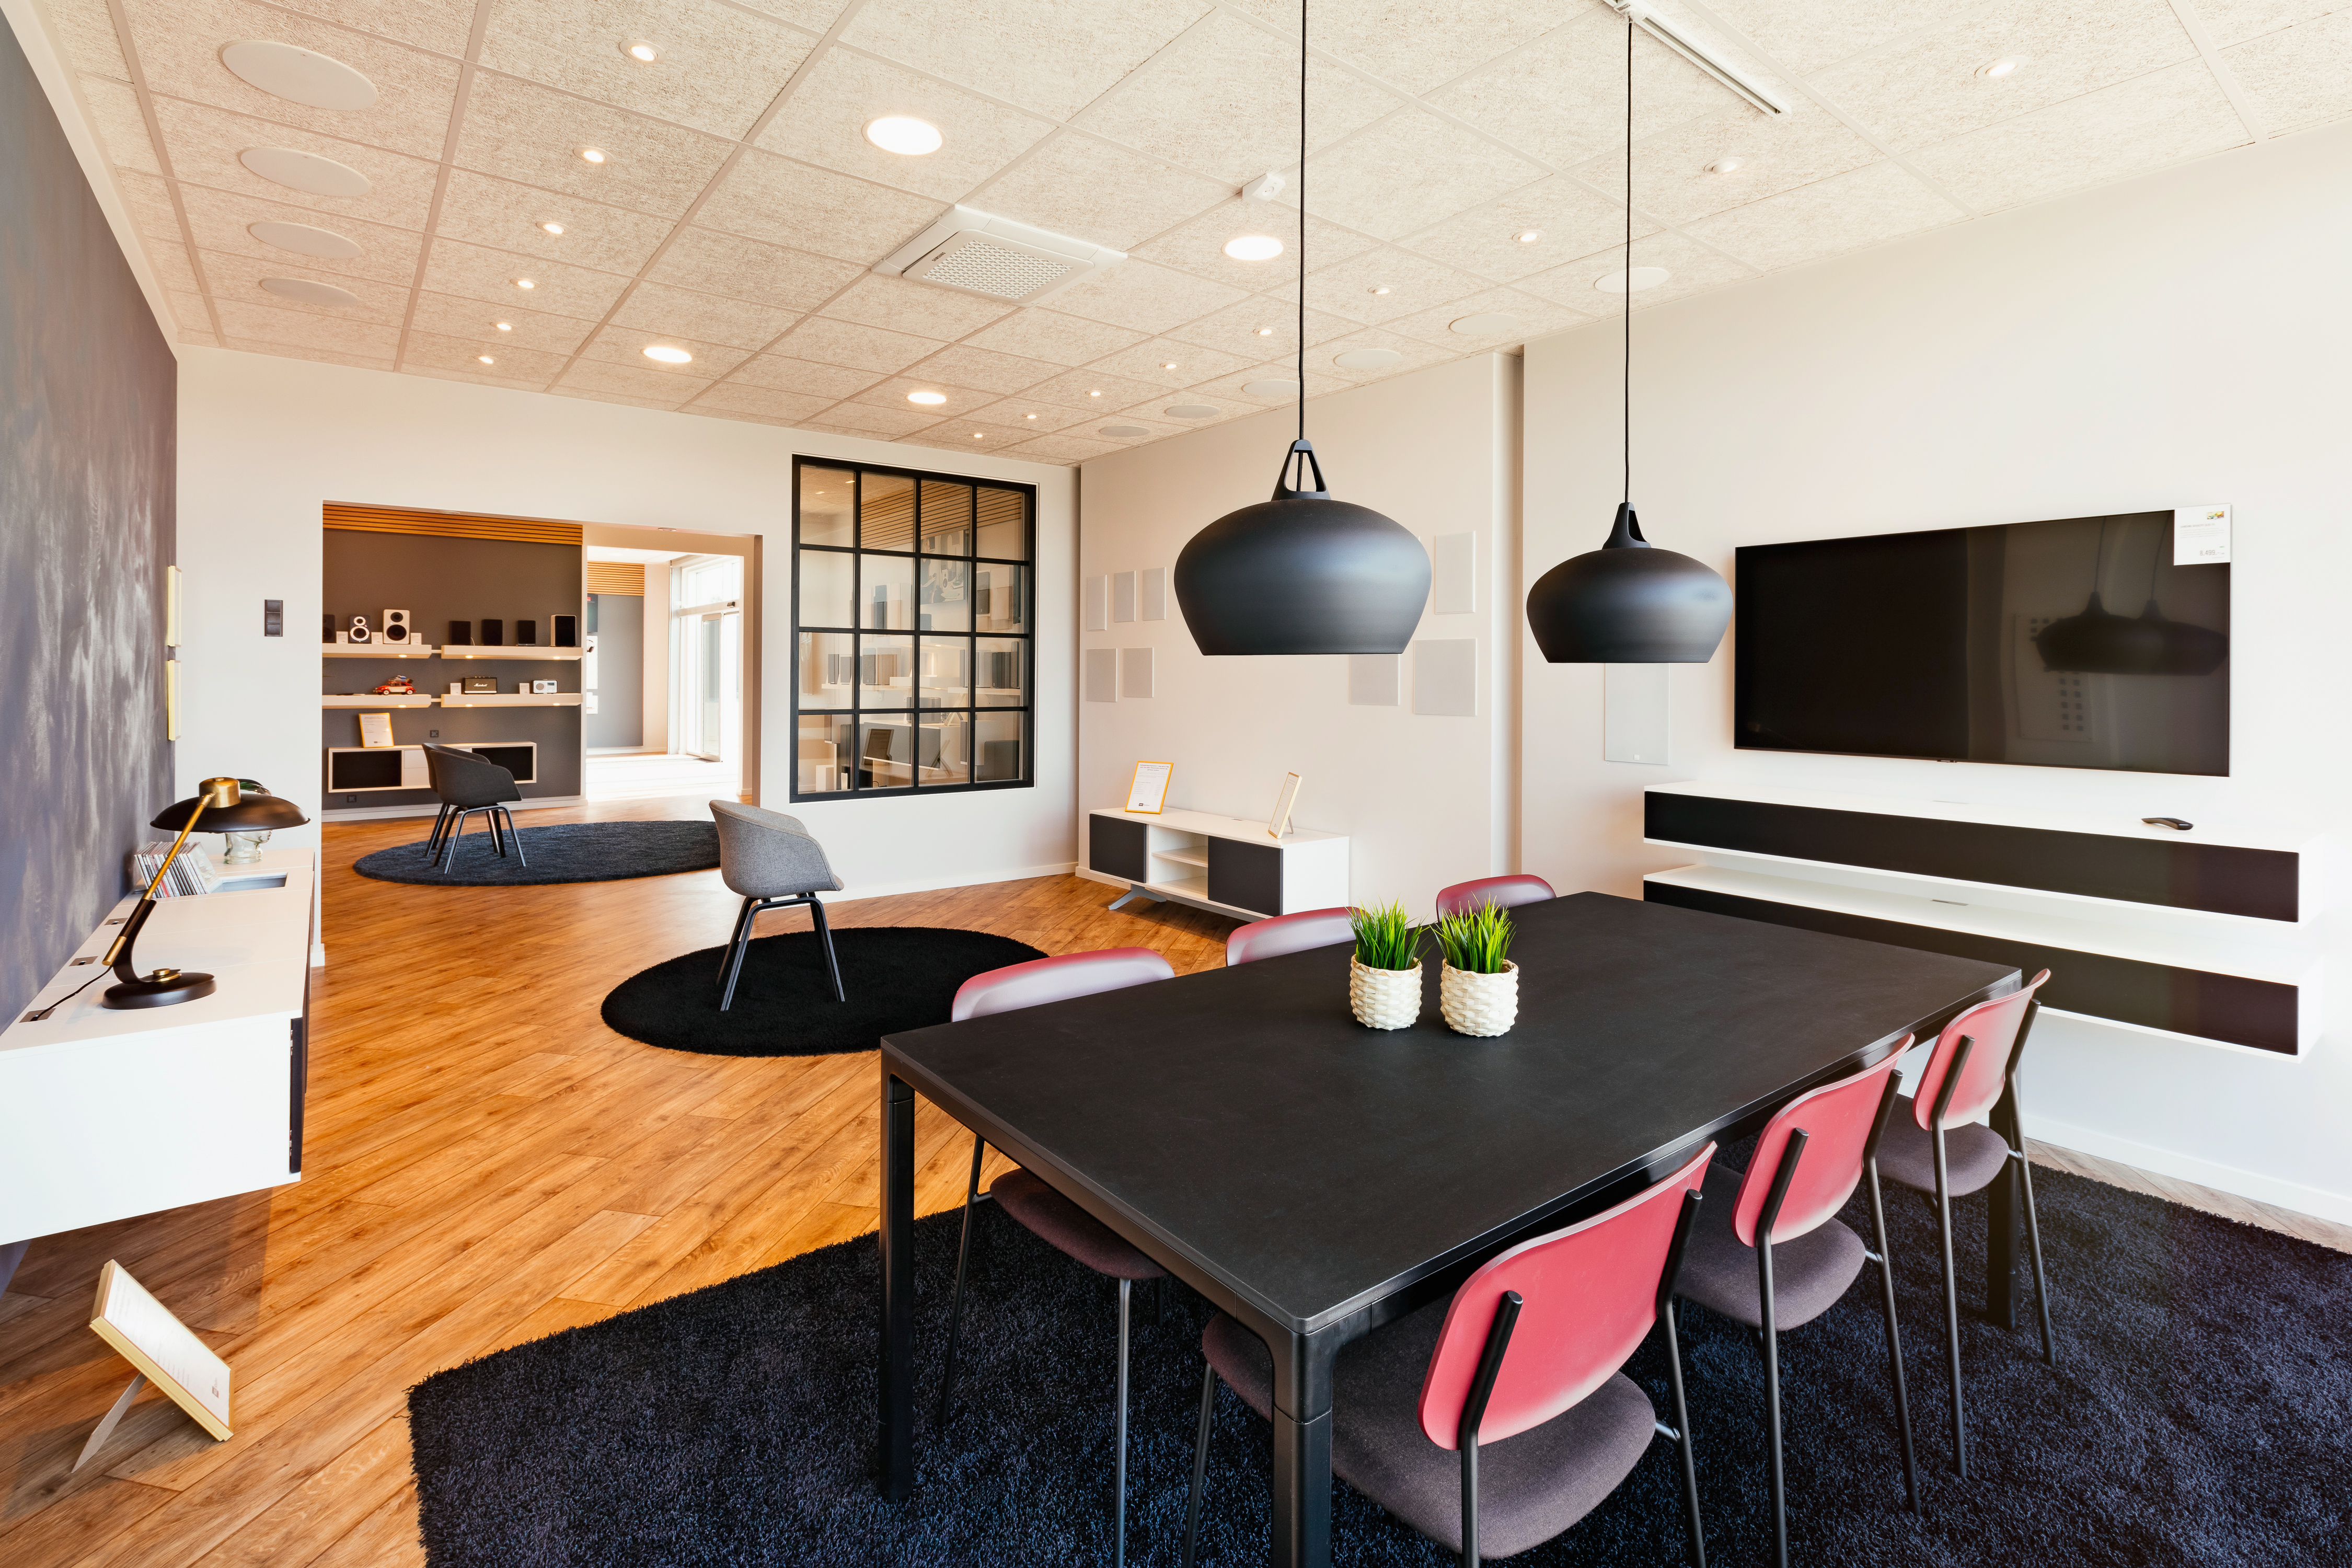 Ny-butik_Aalborg (1).jpg